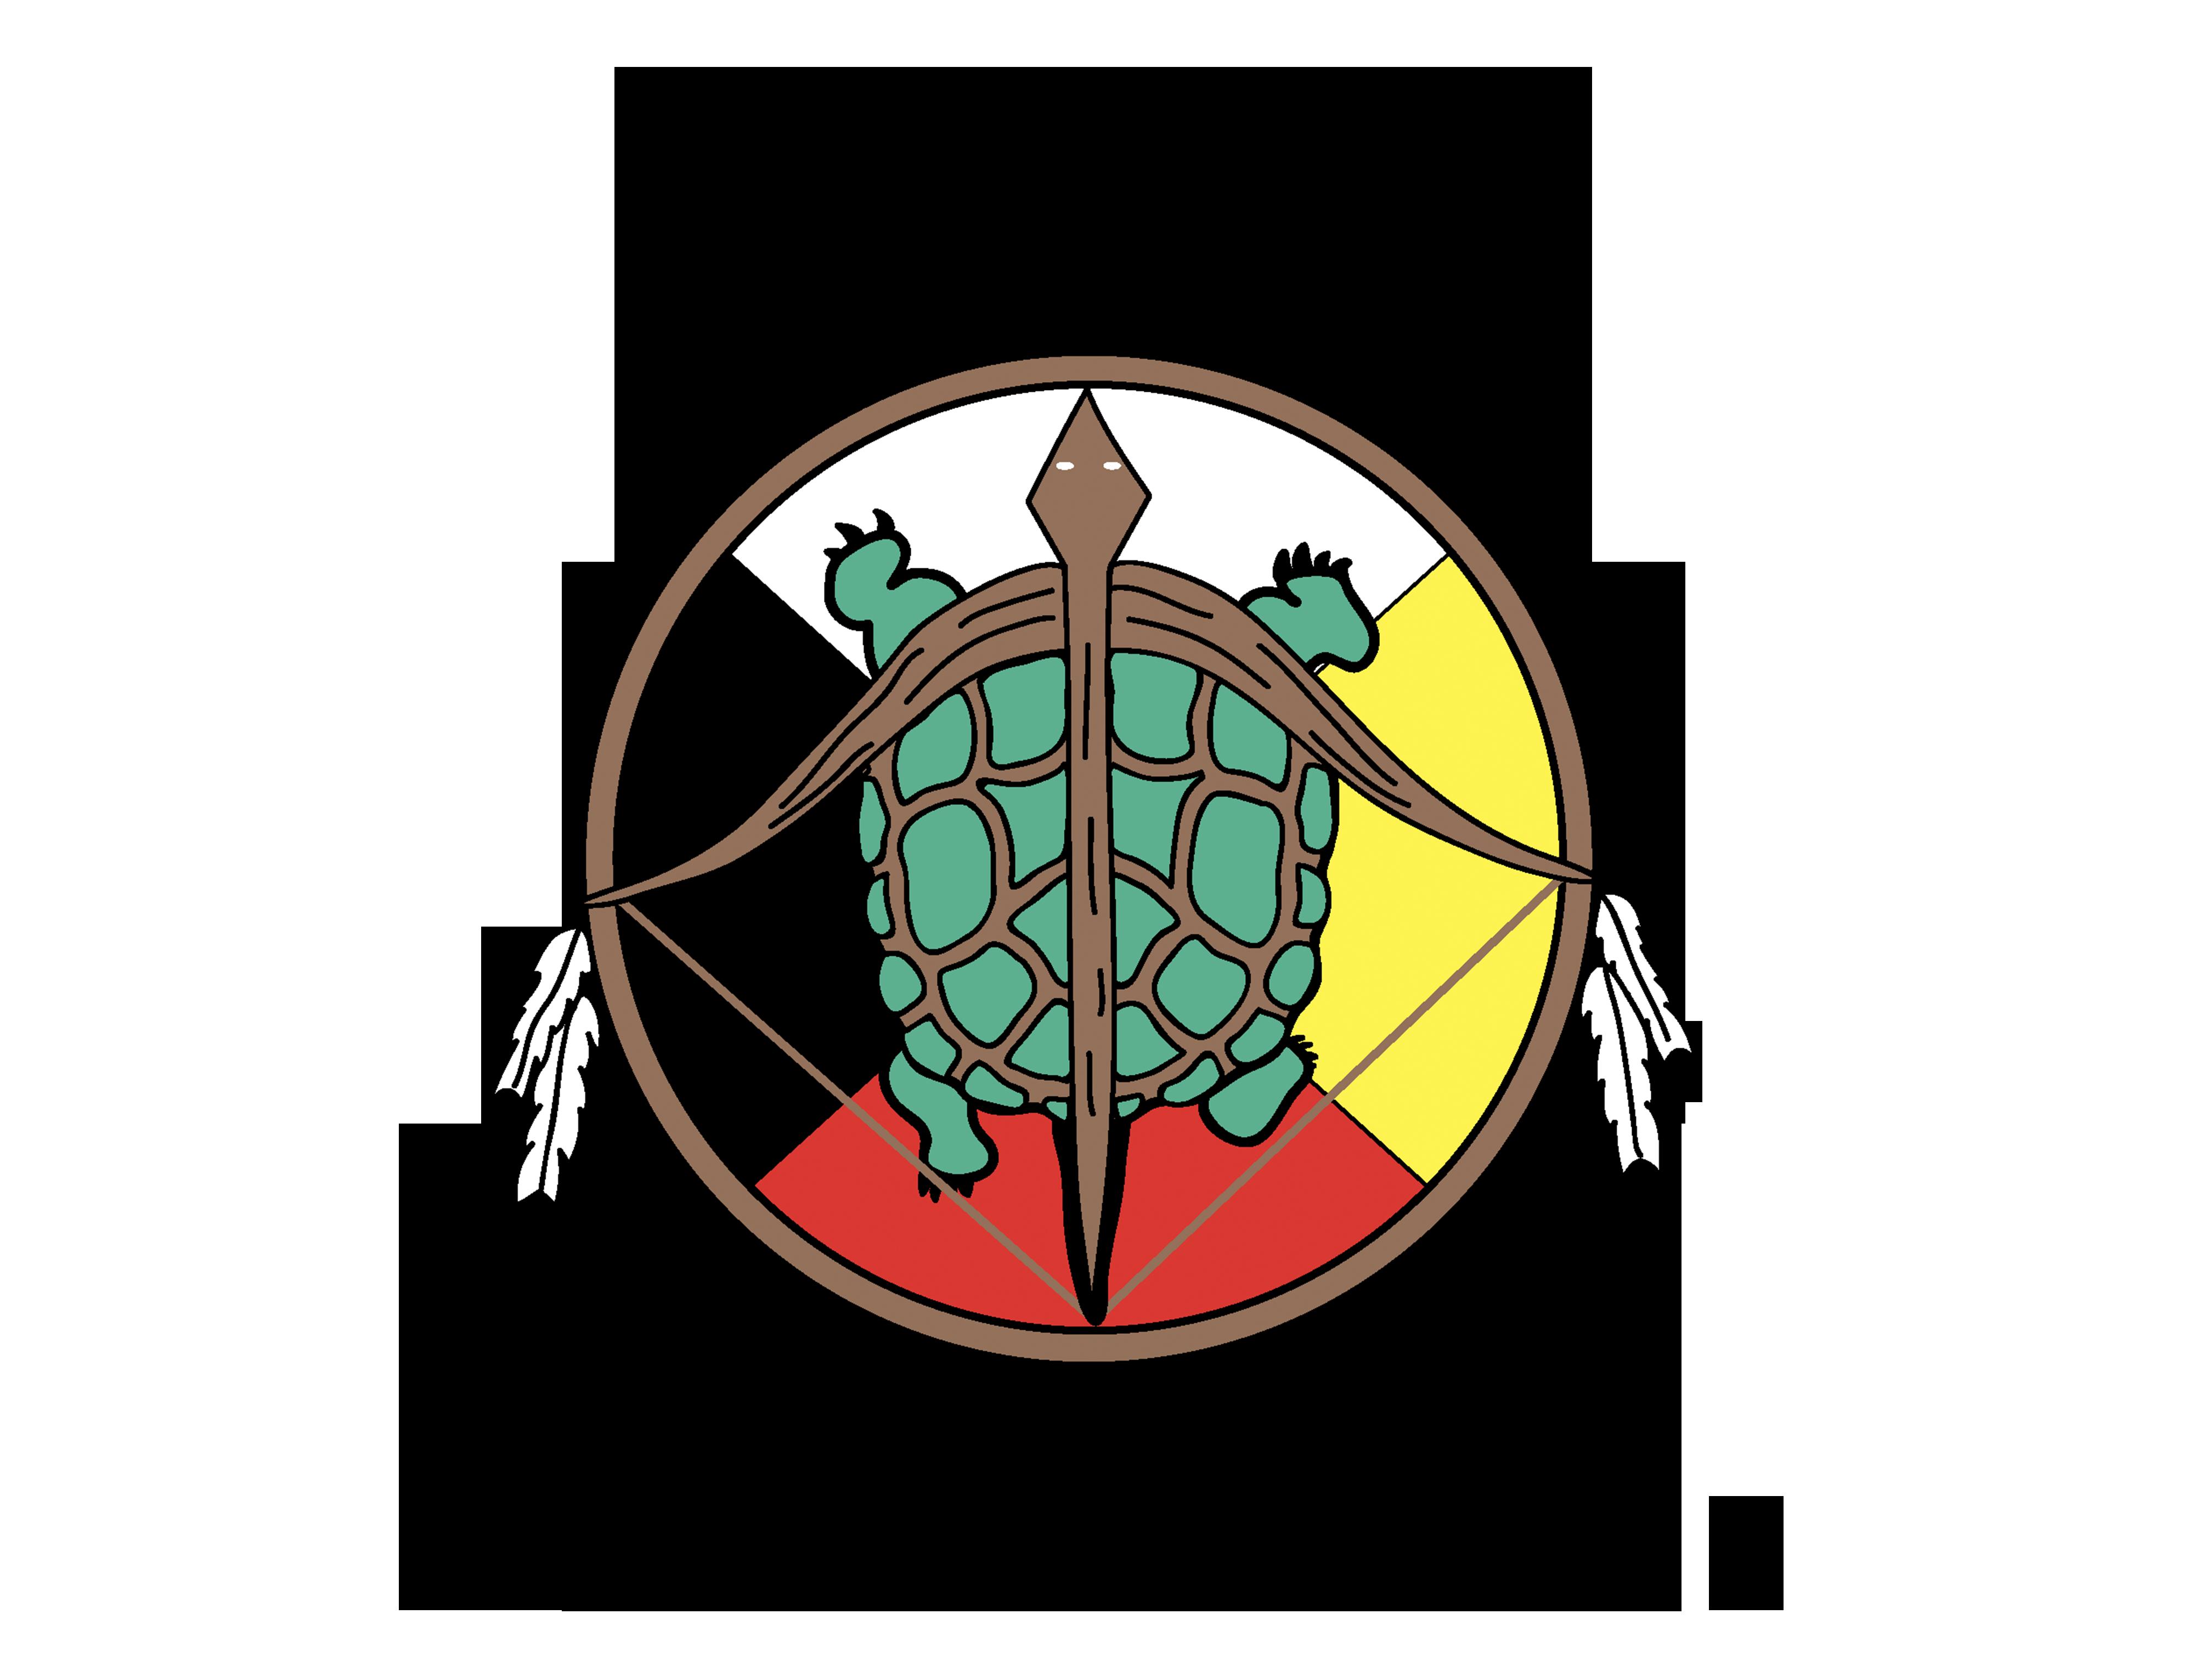 https://0901.nccdn.net/4_2/000/000/038/2d3/turtle-bow-and-arrow-silk-screen-proof.png